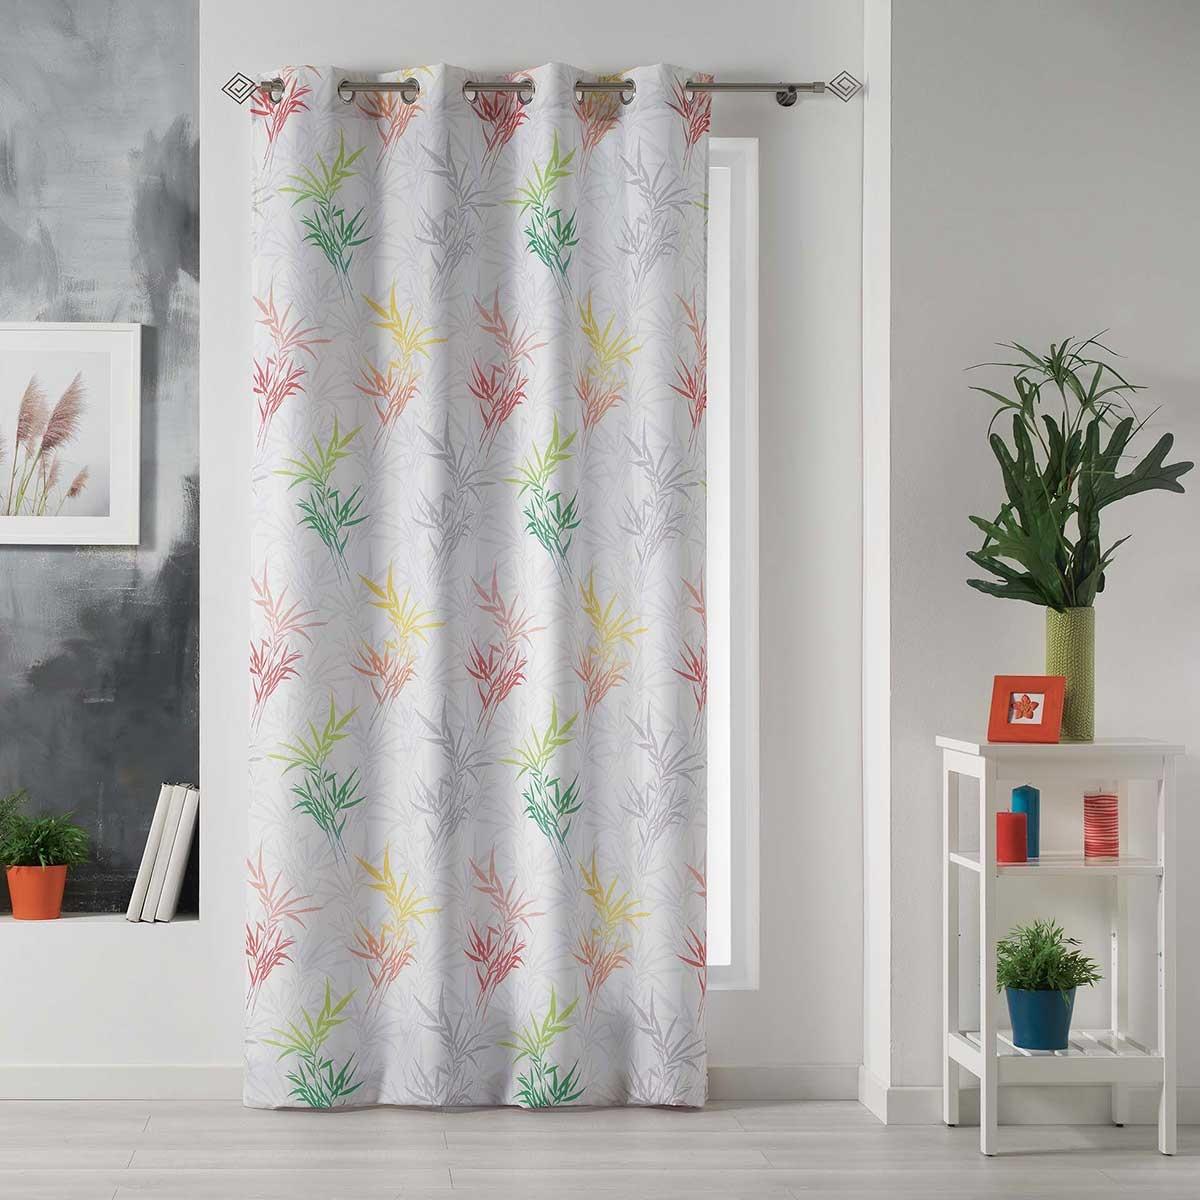 Rideau imprimé bambous multicolores ( Multicolore)